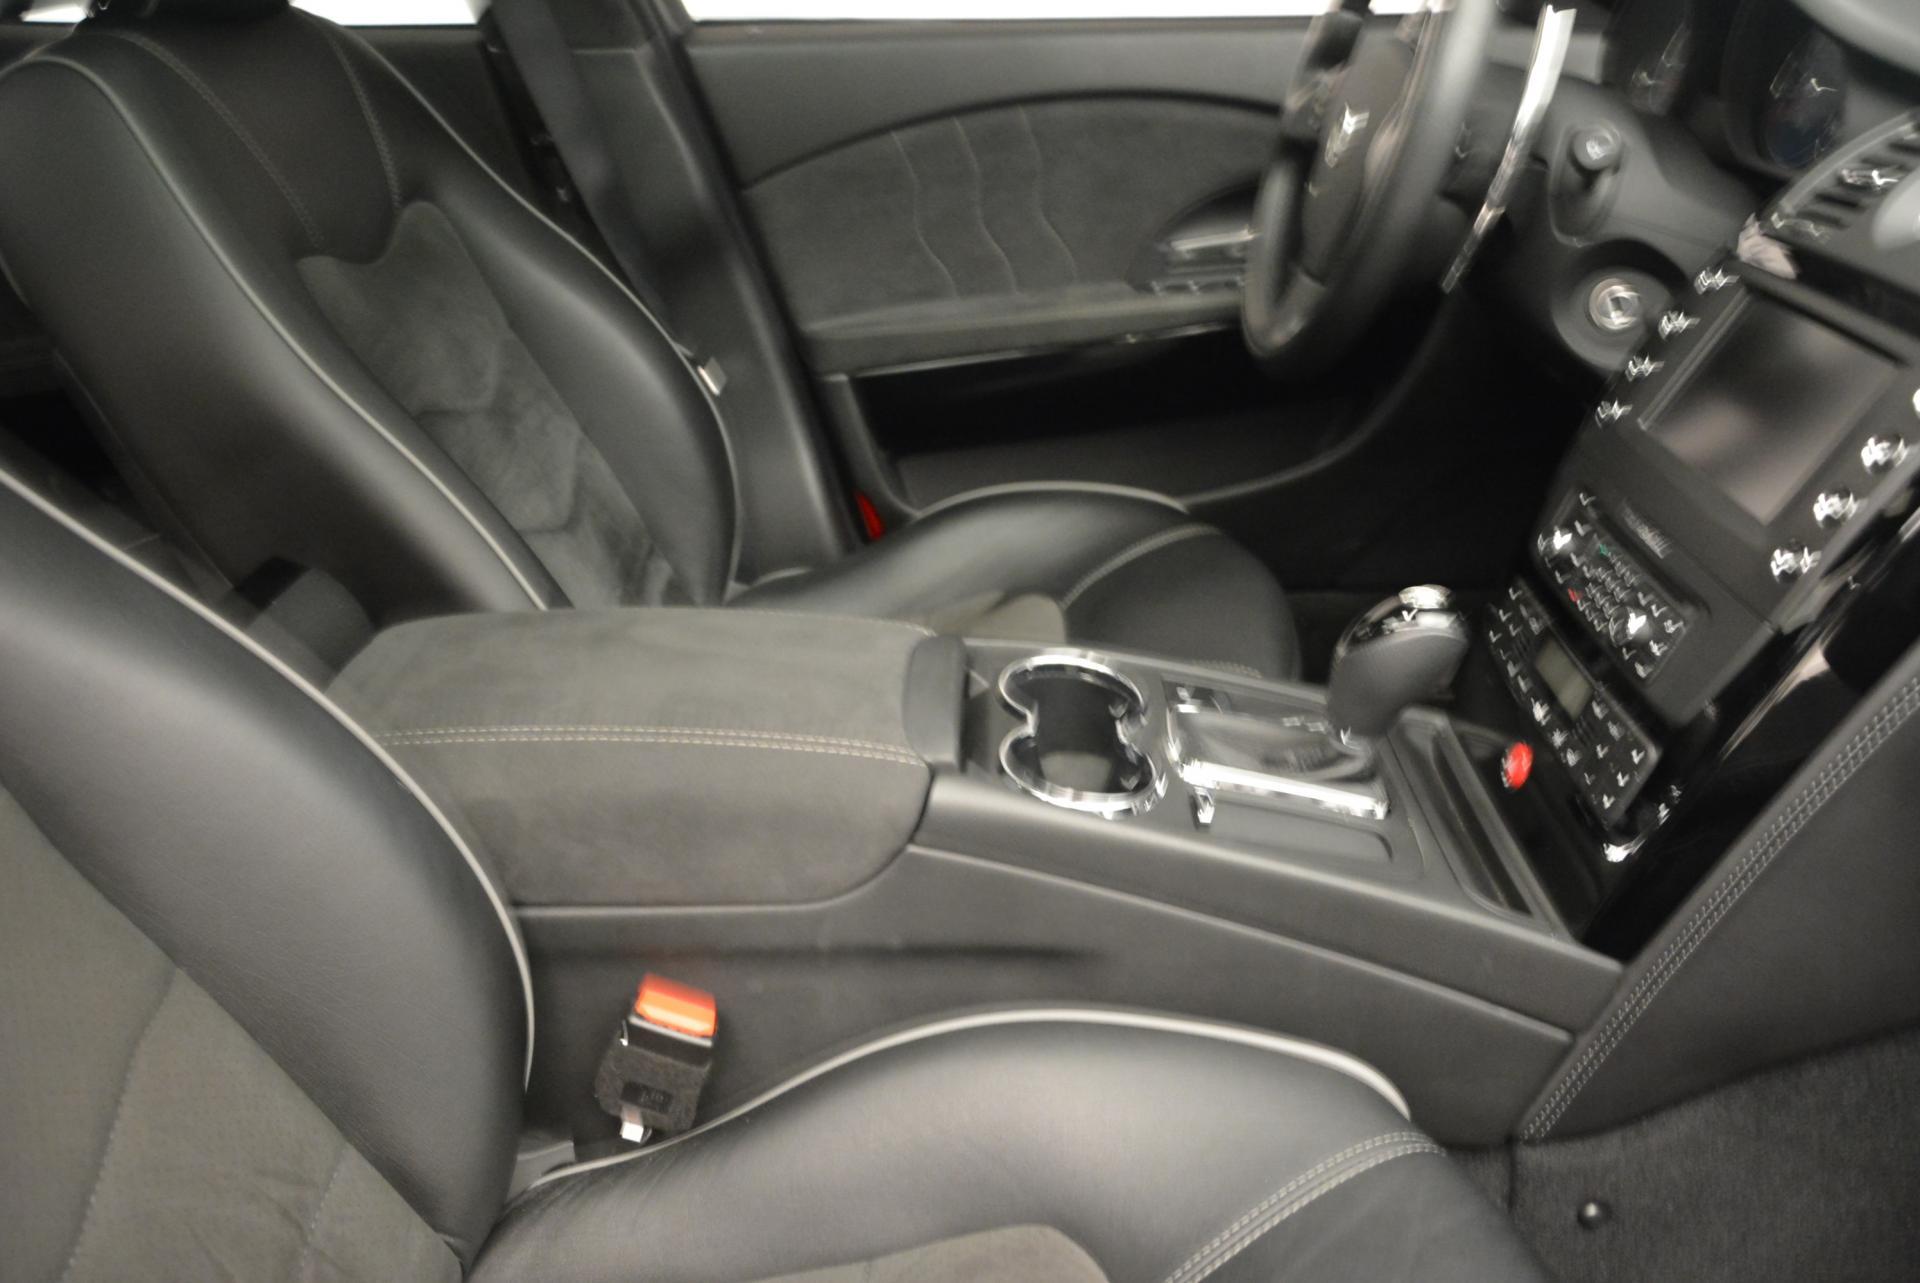 Used 2011 Maserati Quattroporte Sport GT S For Sale In Westport, CT 531_p23